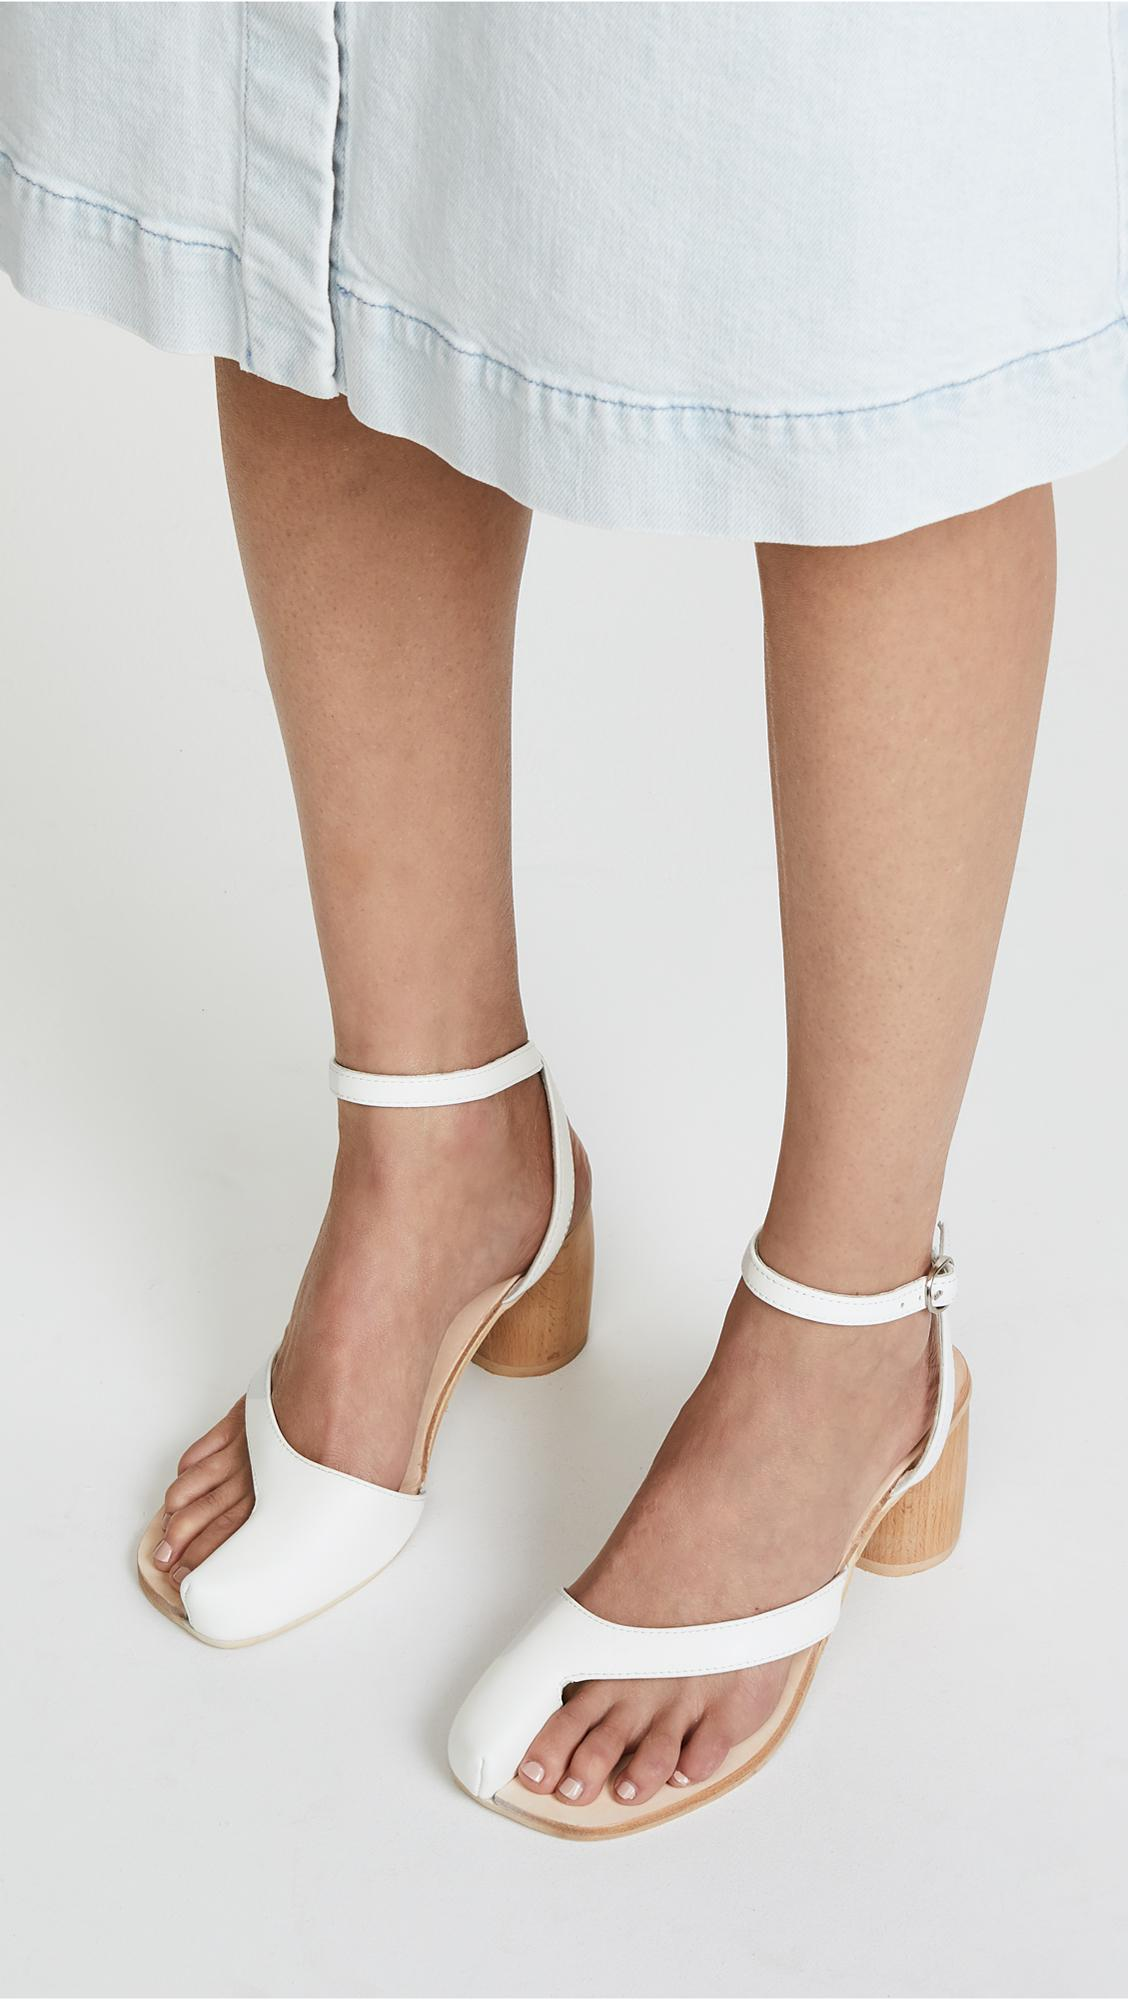 eb483524dd3 Jeffrey Campbell Hex Block Heel Sandals in White - Lyst